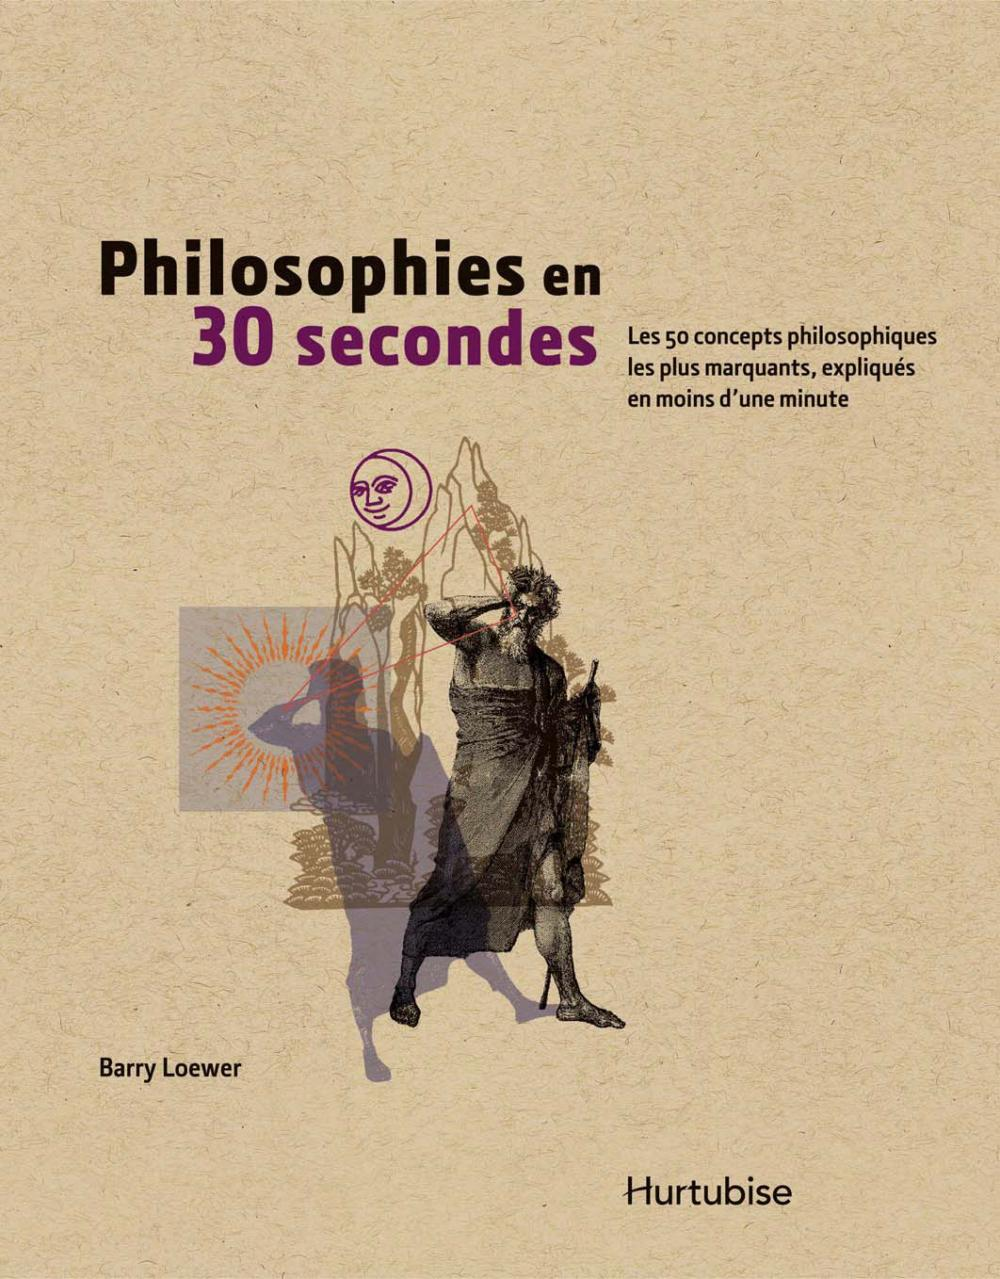 Philosophies en 30 secondes